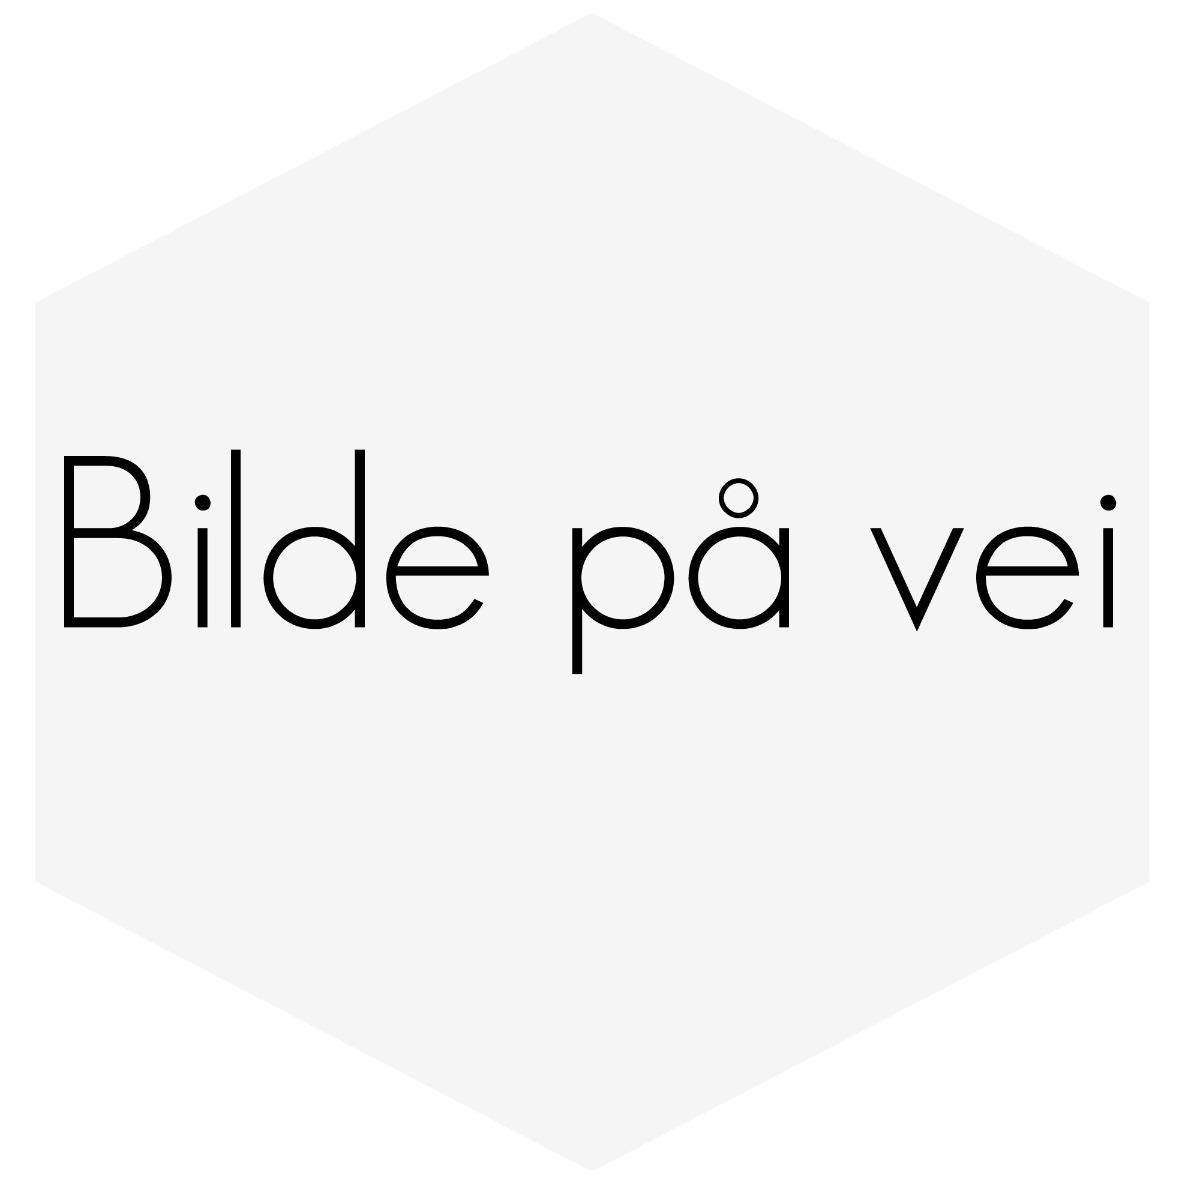 "SILIKONSLANGE RØD REDUSERING 3,125-4"" (80-102MM)"